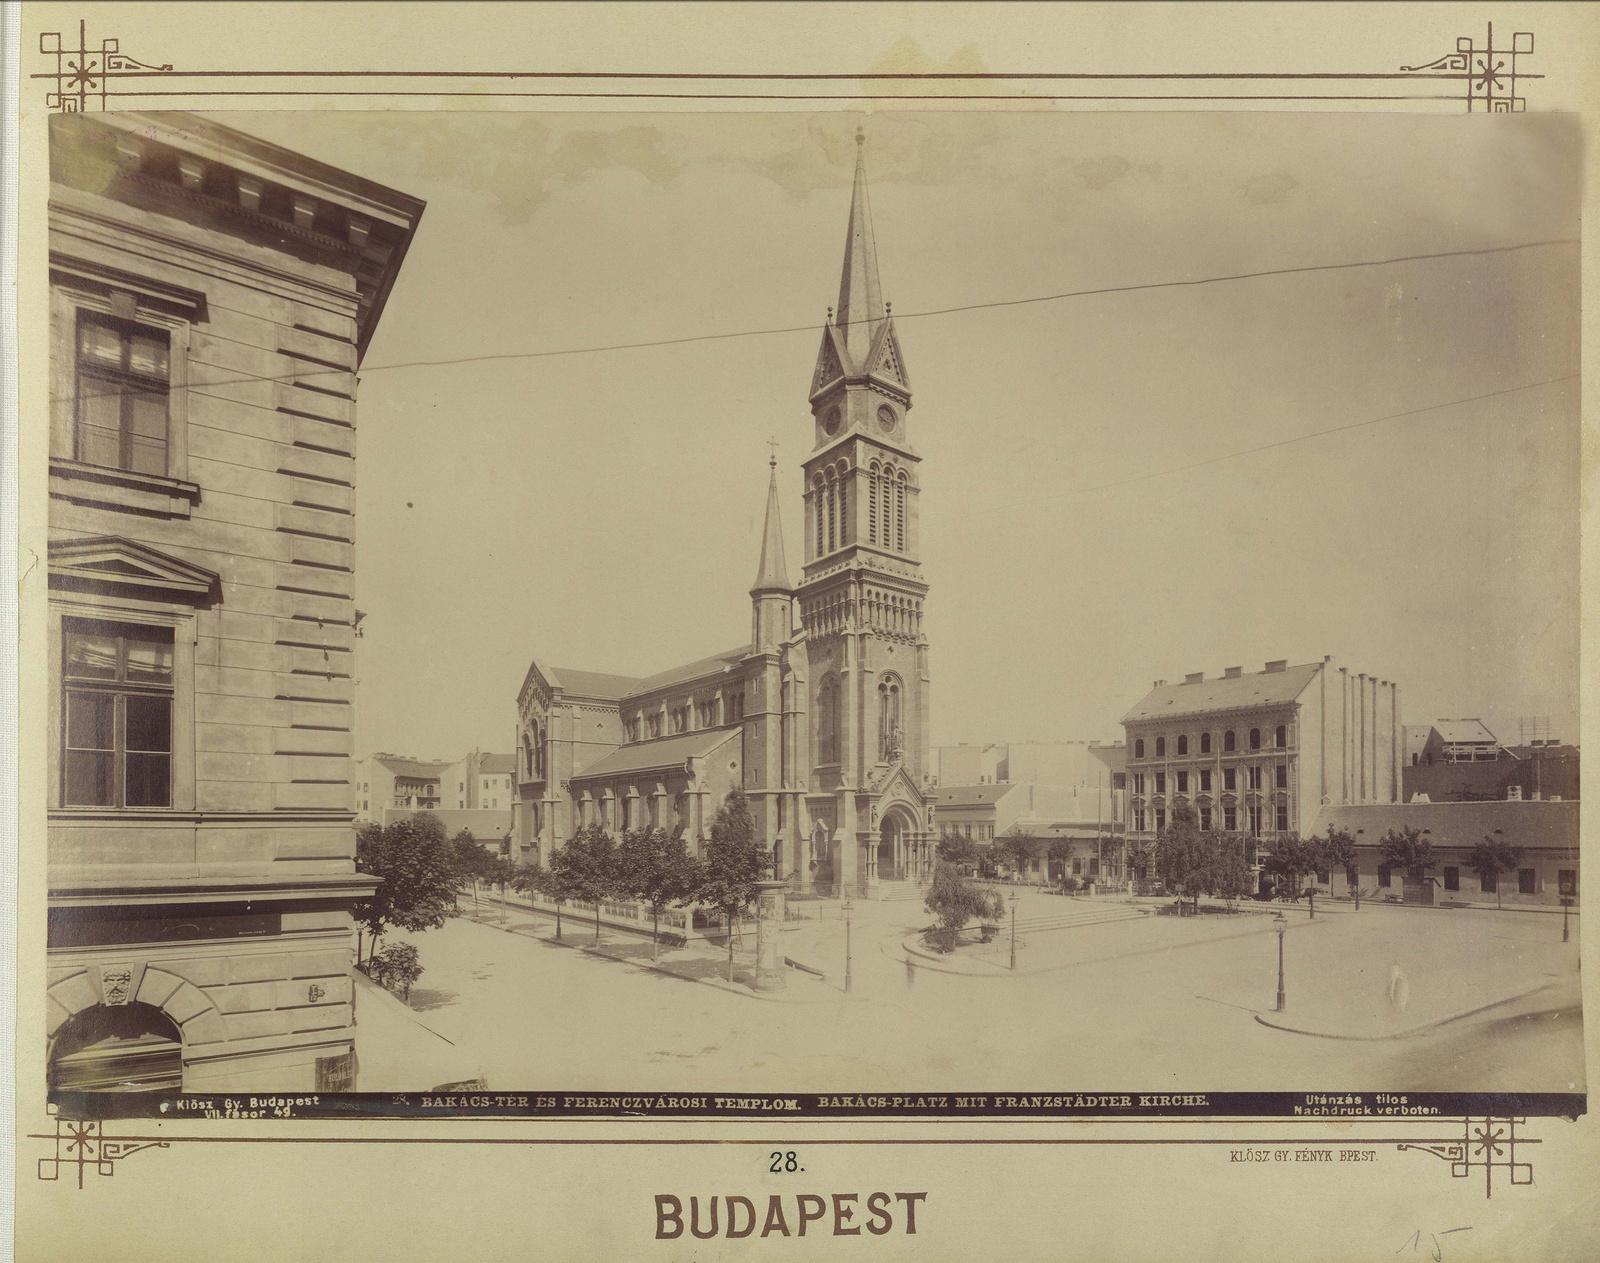 BakatsTeriTemplom-1890Utan-KloszGy-fortepan.hu-82353